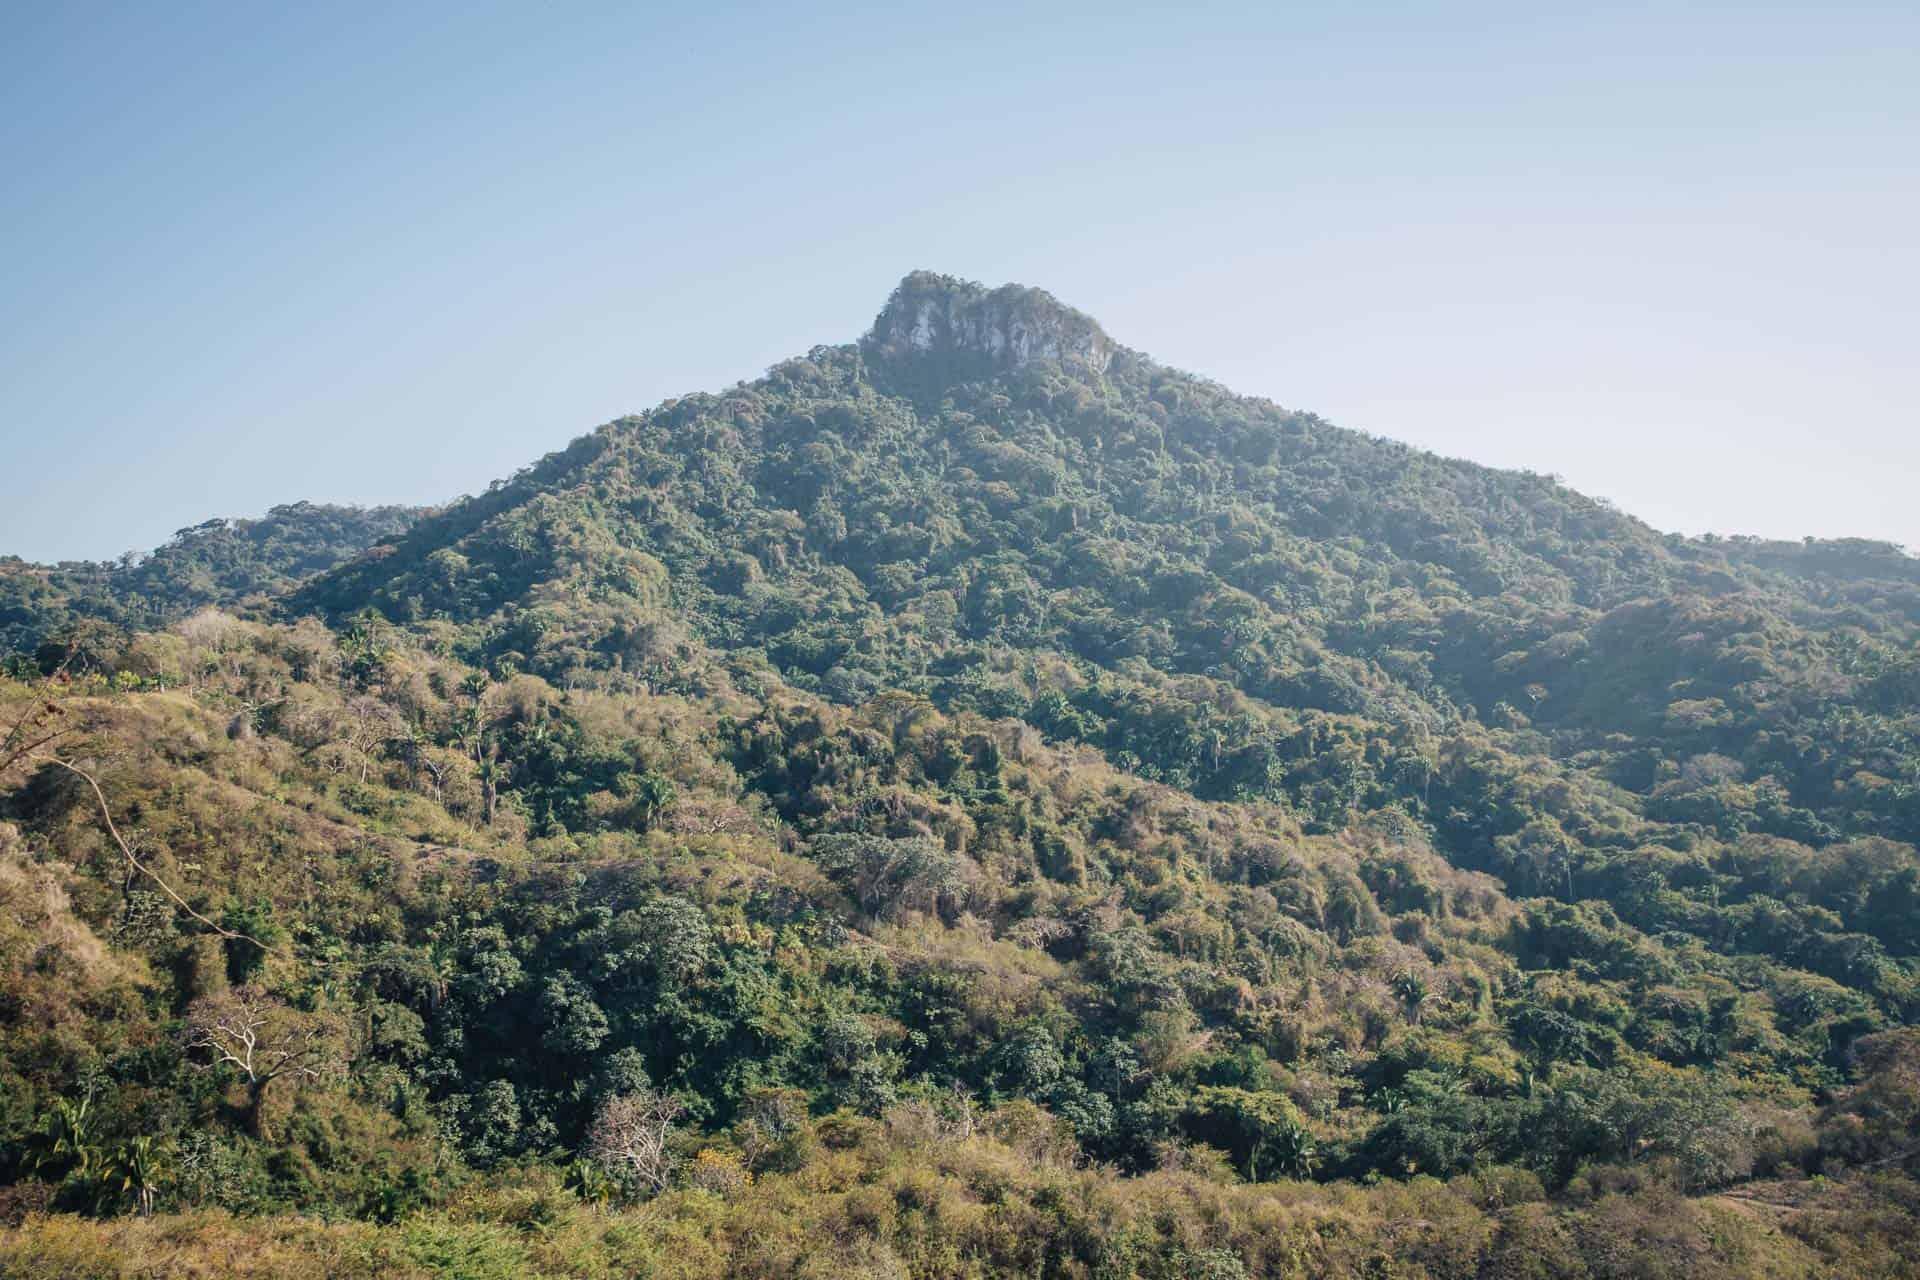 things to do in sayulita, sayulita mexico, what to do in sayulita, sayulita, monkey mountain sayulita